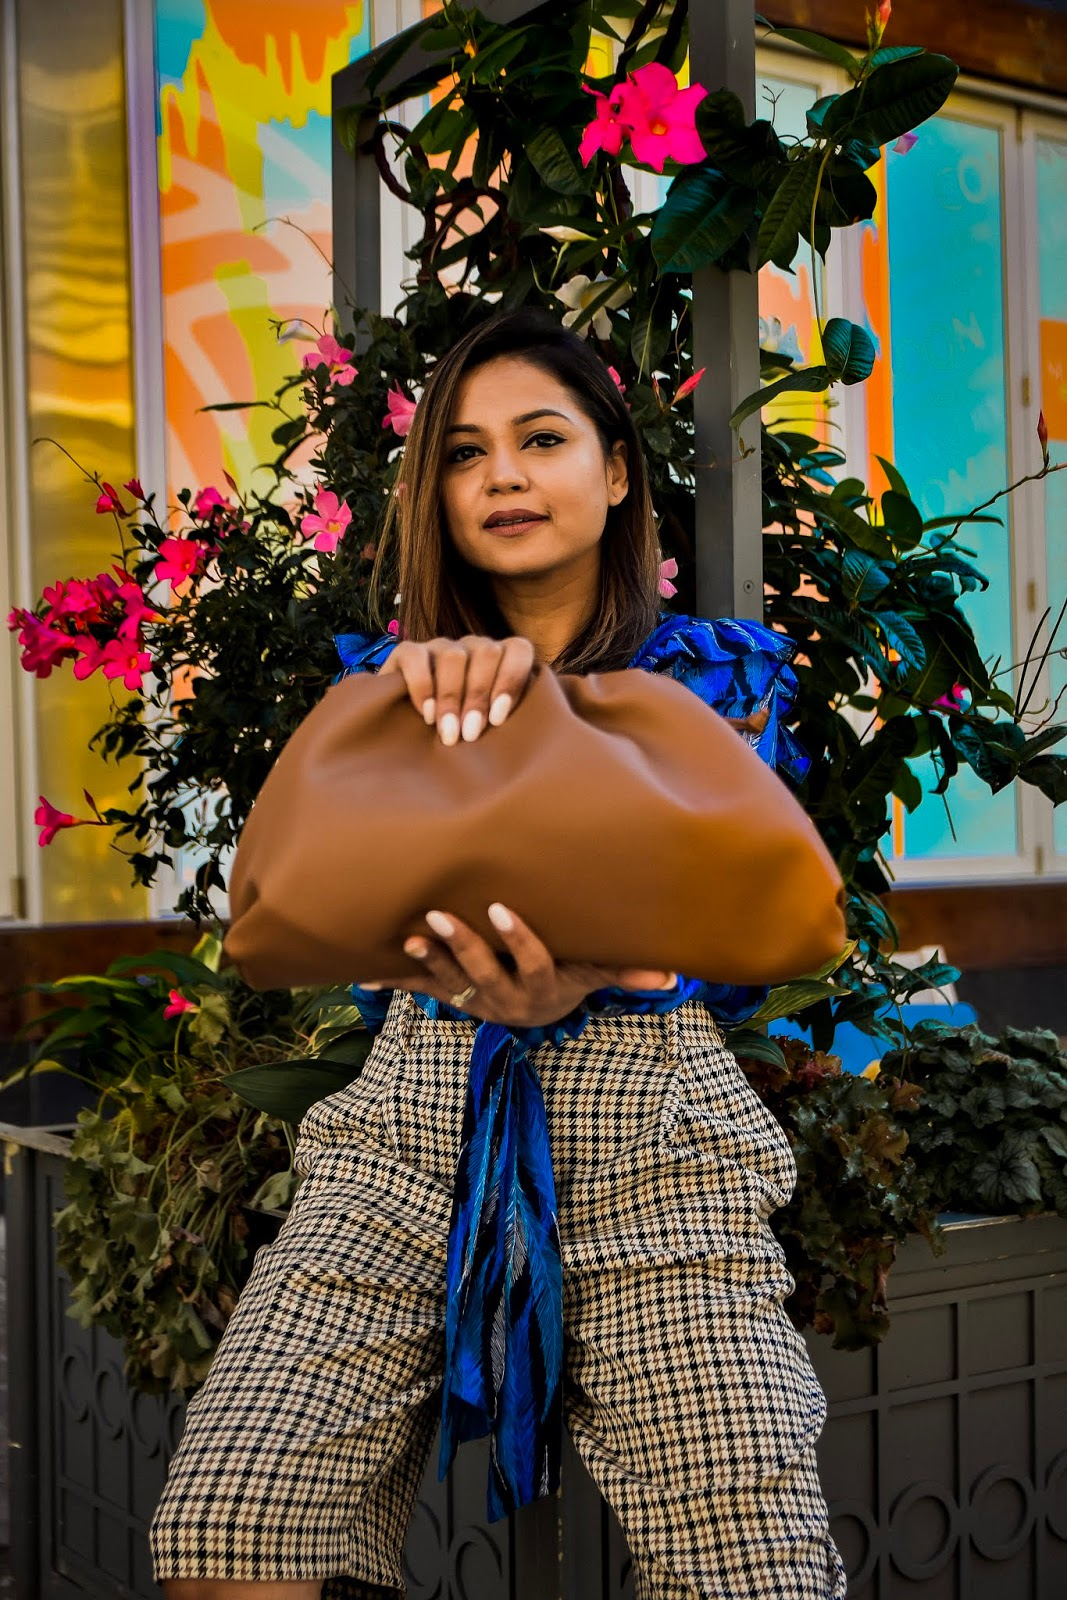 top trending bags for fall 2019, bag season, bag talk, slouchy bags, croc embossed bags, fashion talk, top five bags for fall, fall fashion, myriad musings